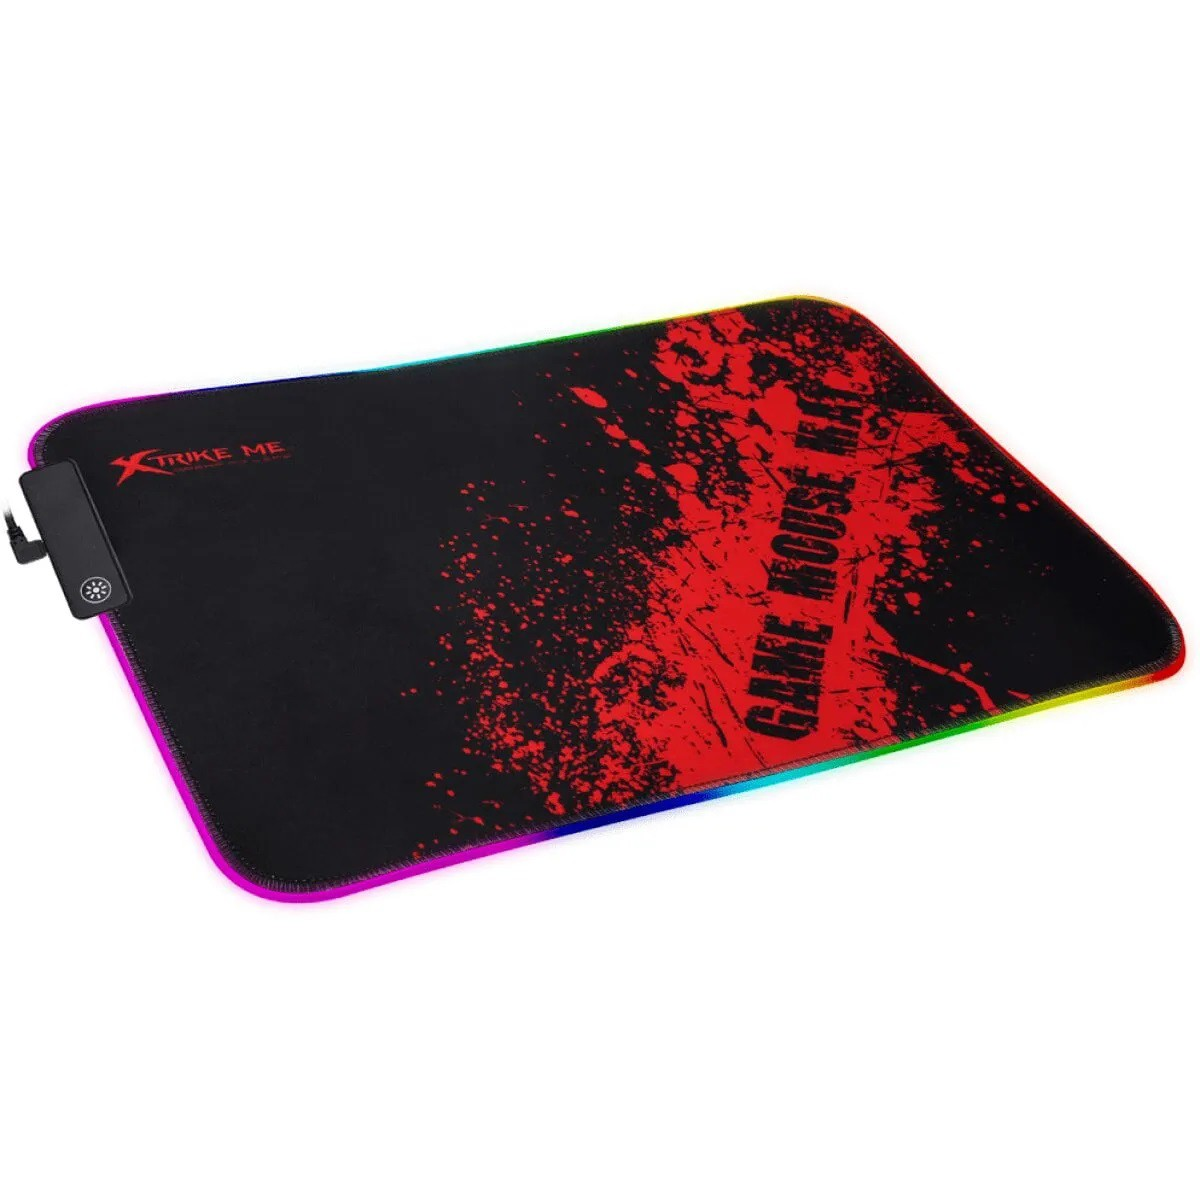 MousePad Gamer XTRIKE-ME, RGB - MP-602